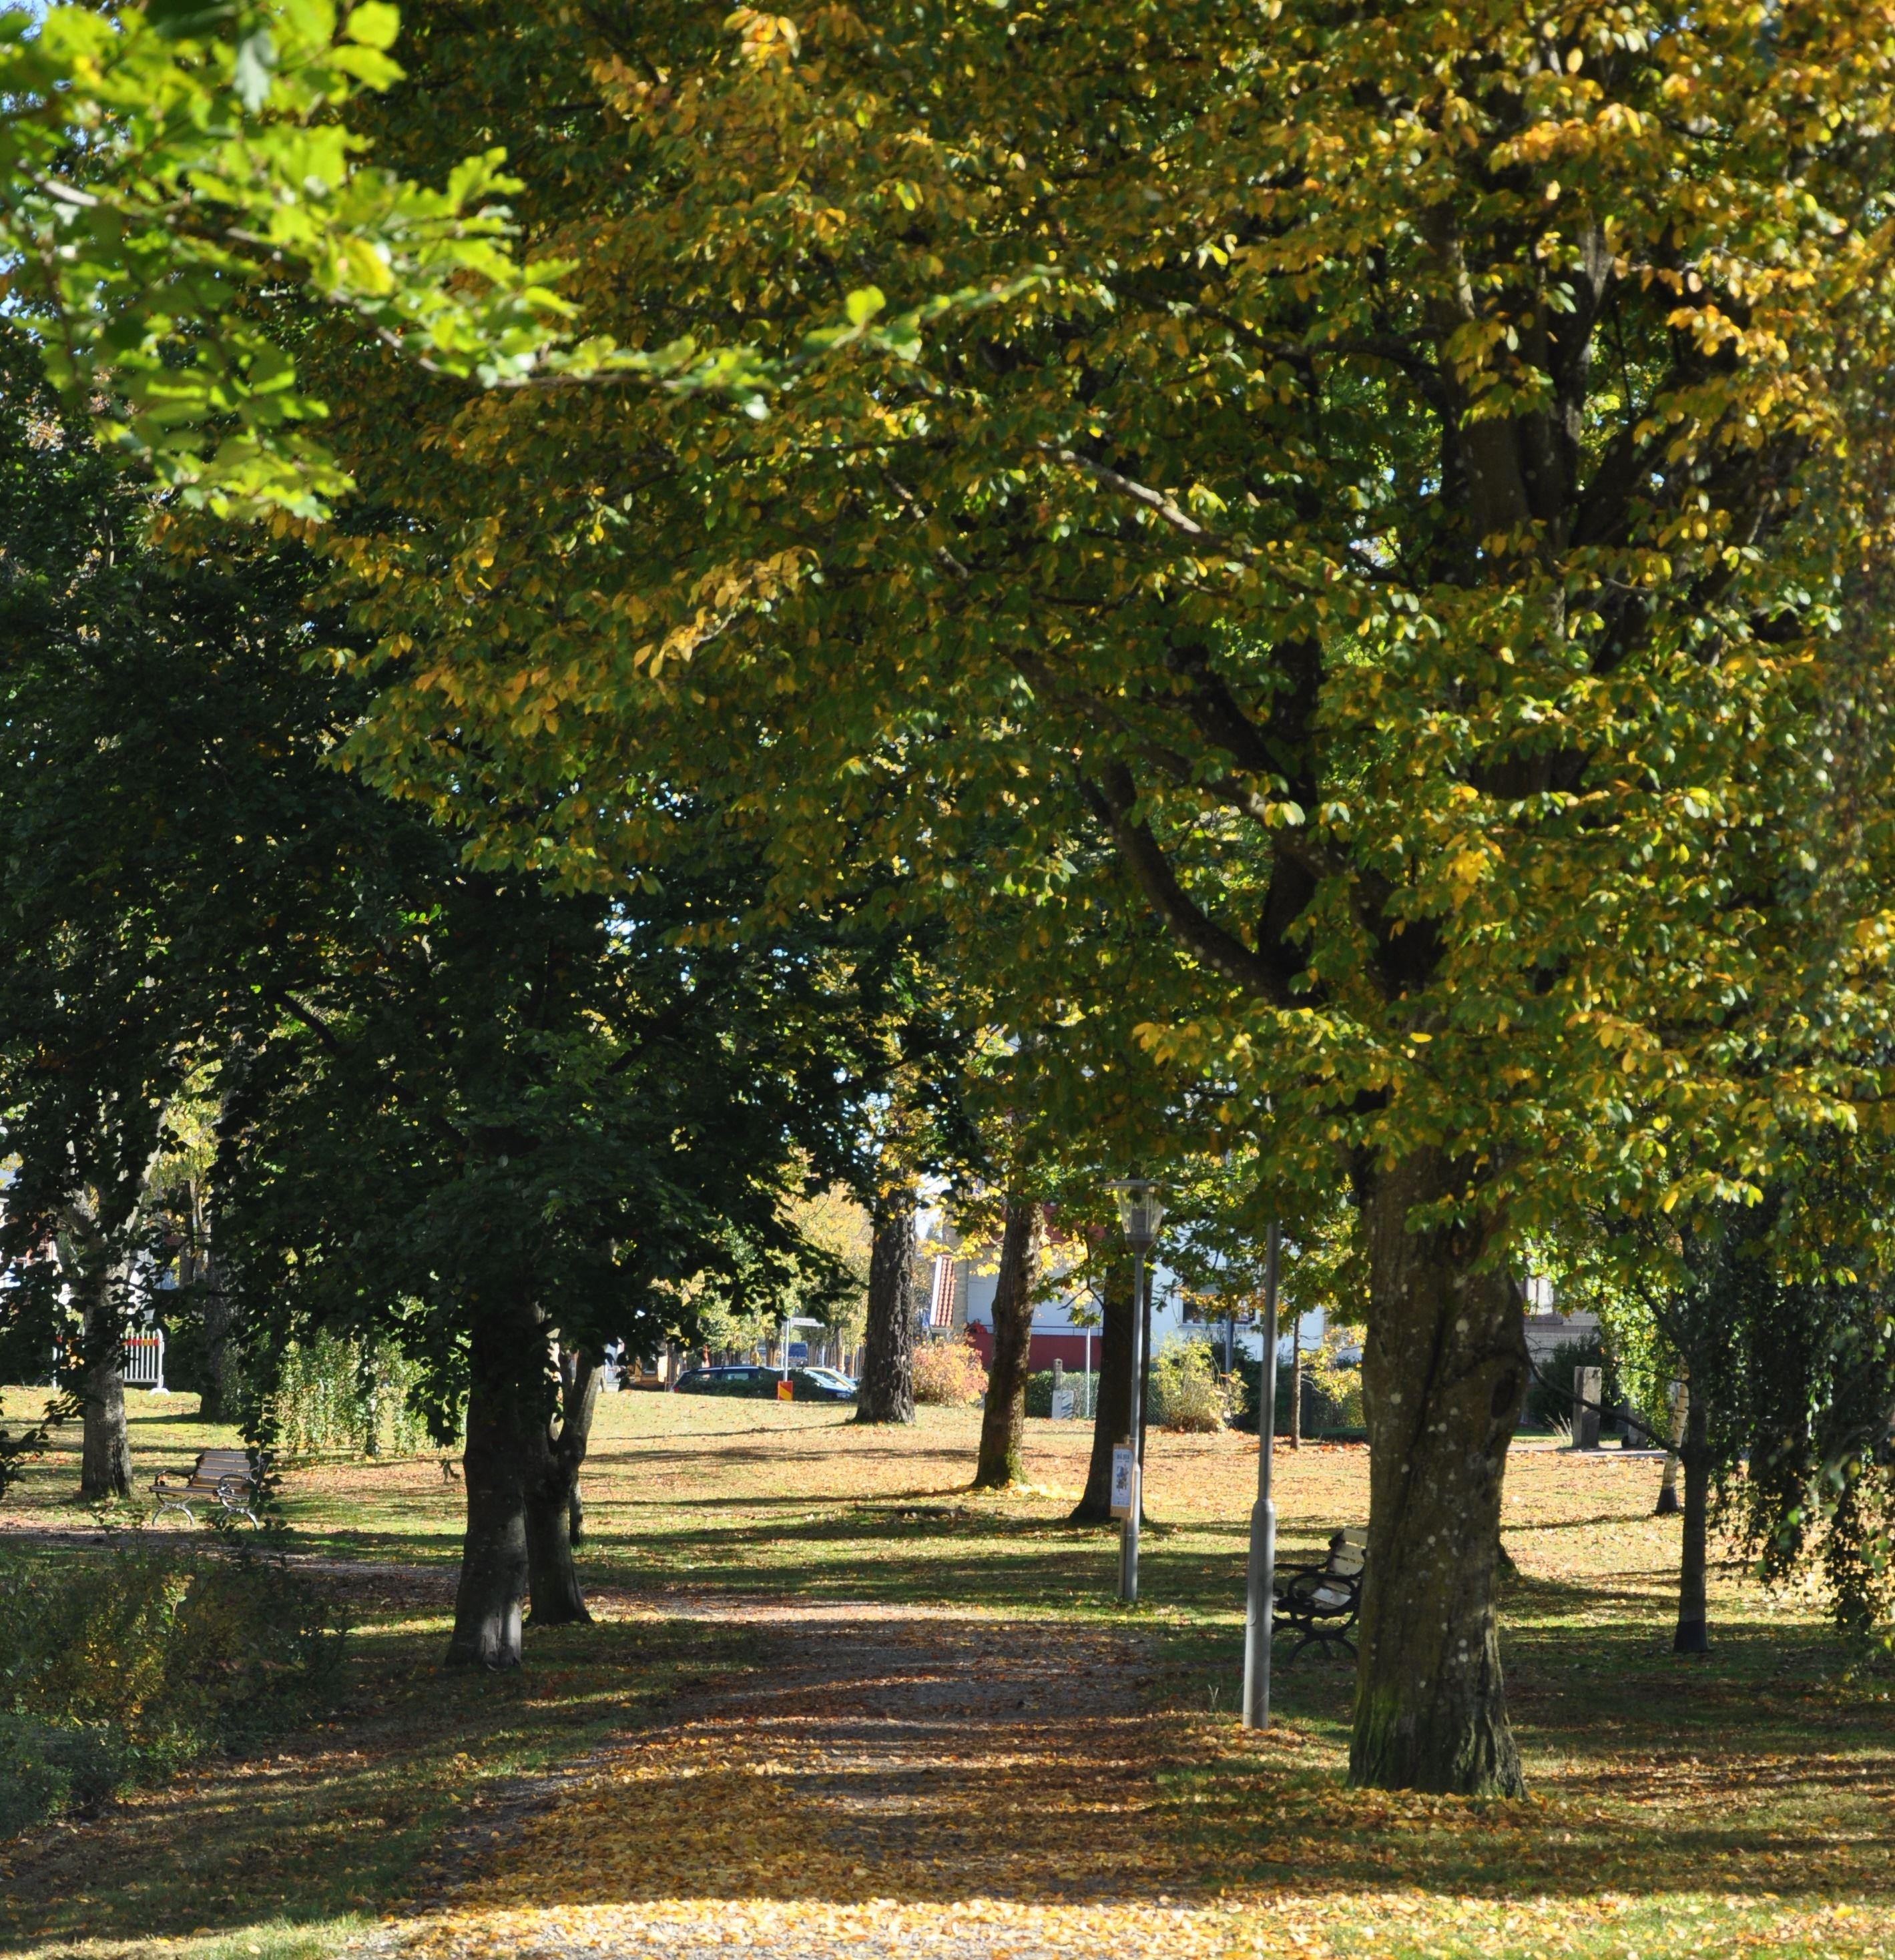 Björkparken (Der Birke-Park)